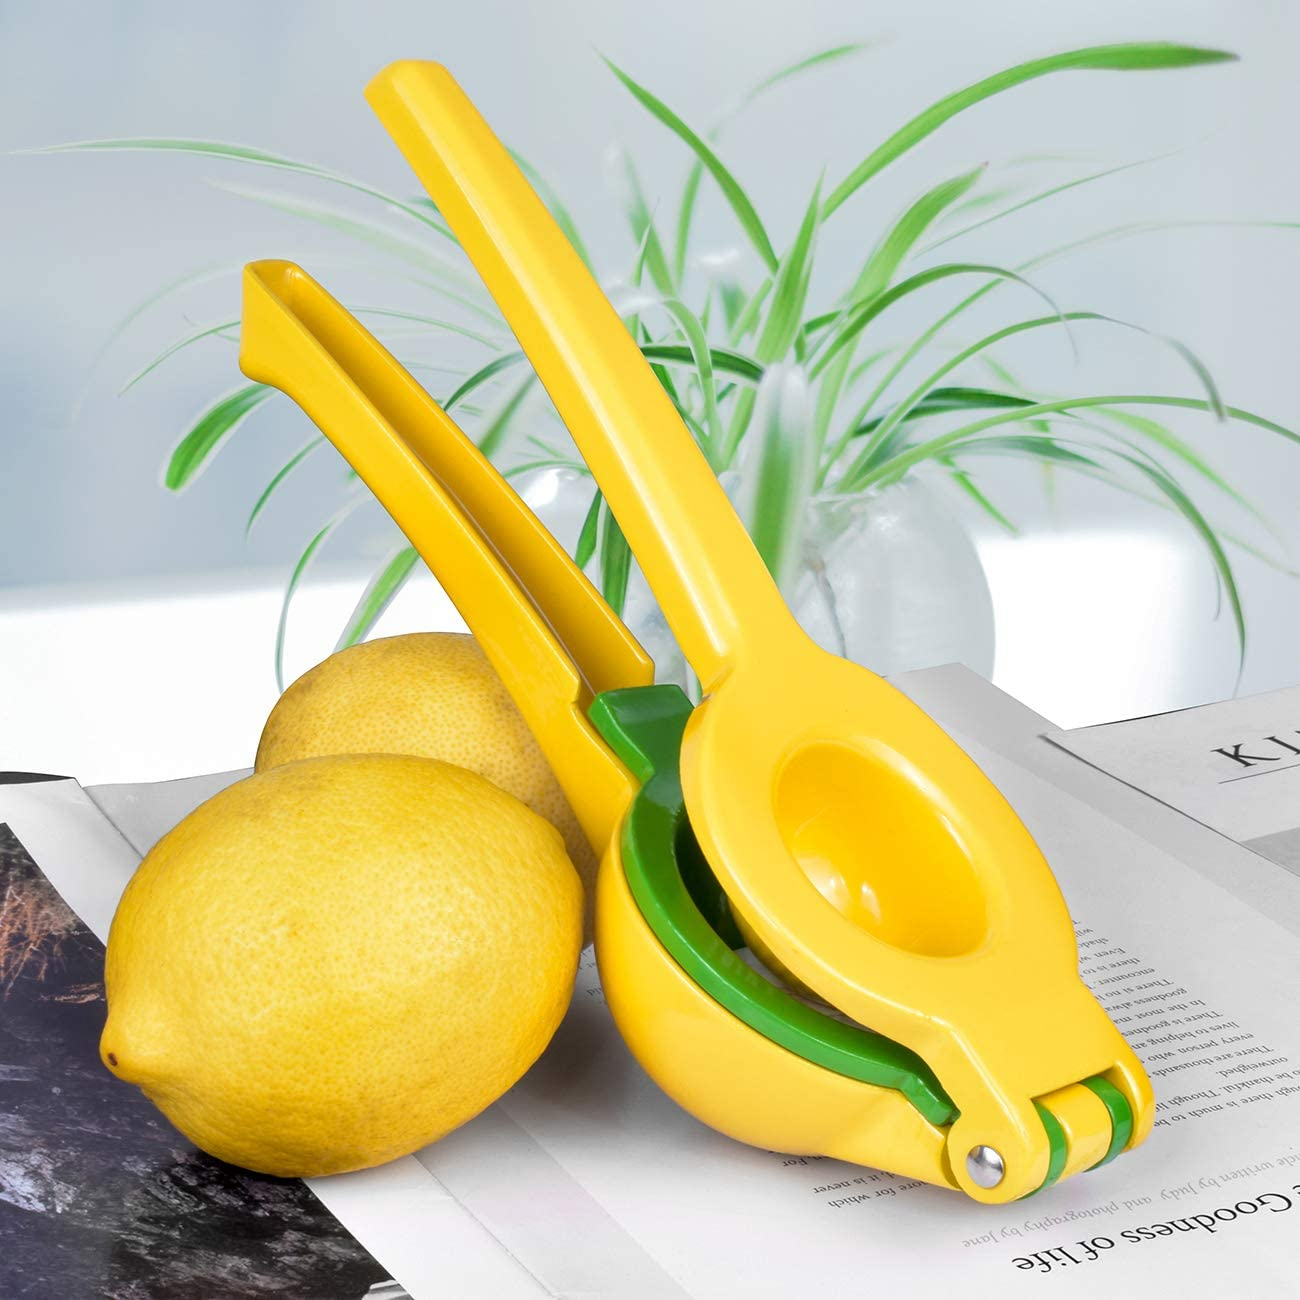 Yellow Efficient Extraction Lemon Squeezer Citrus Juicer Press Premium 2-in-1 Hand Lime Squeezer Quality Aluminum Alloy Manual Fruit Juicer Durable